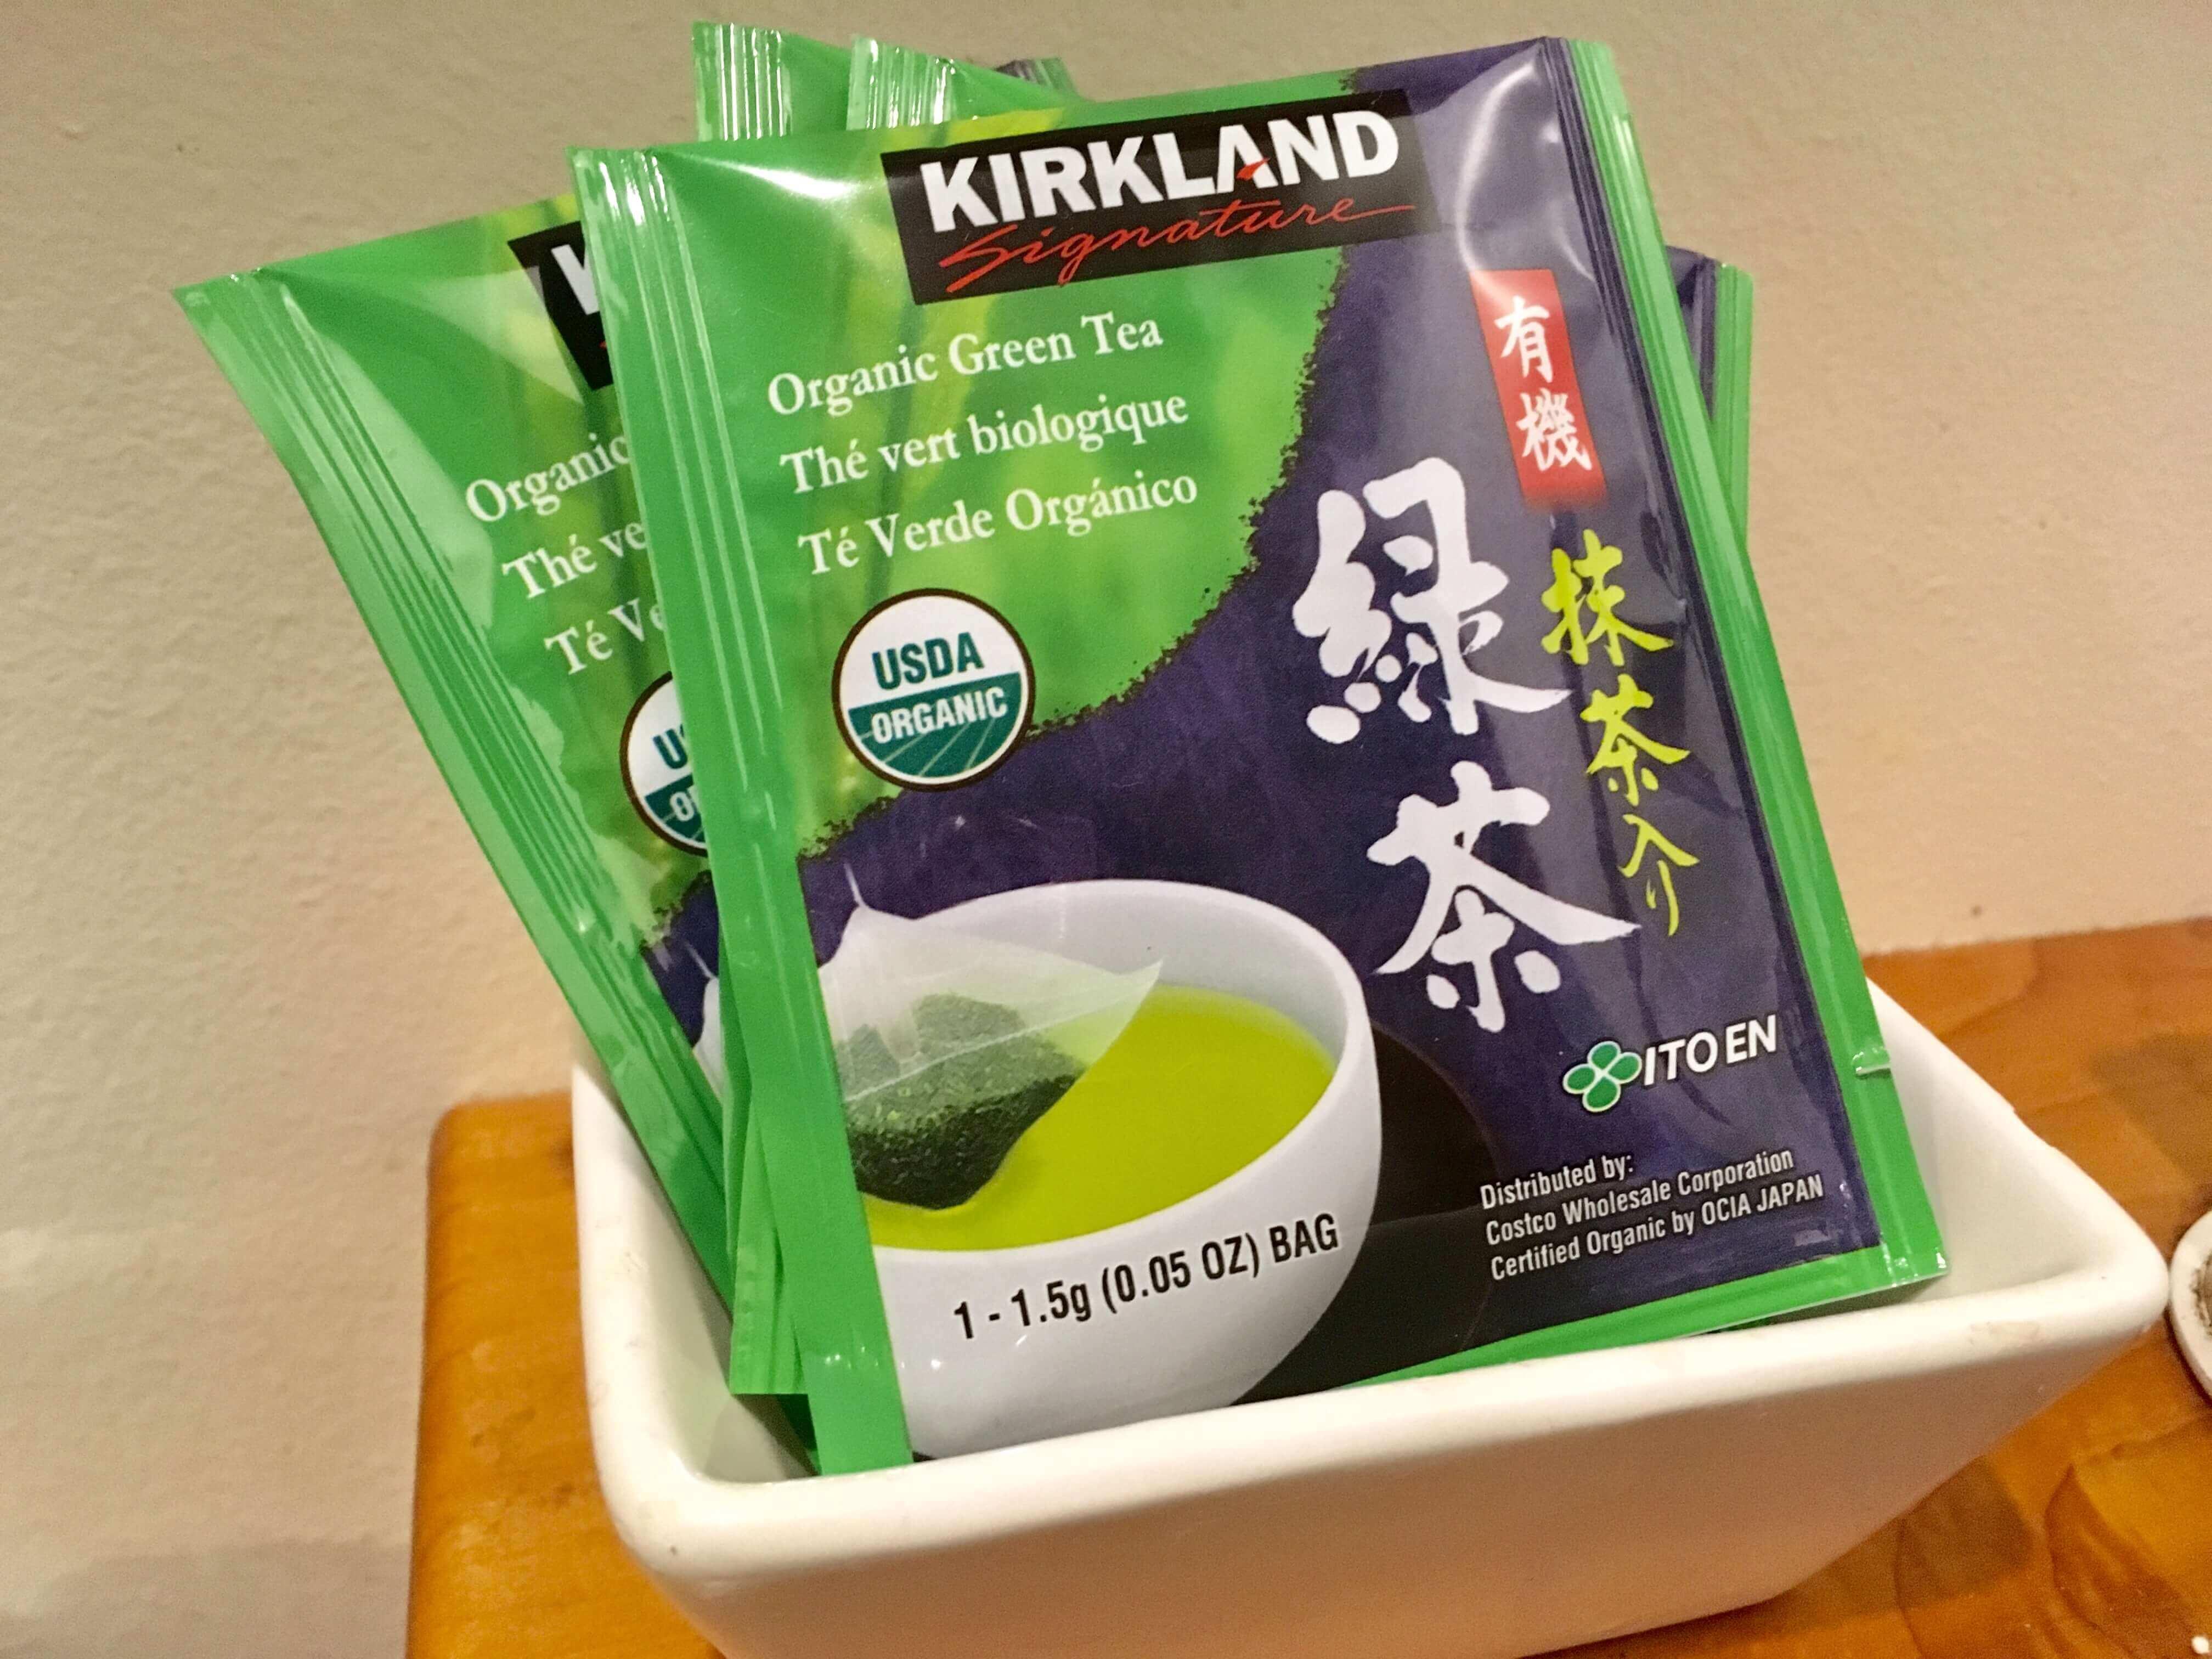 Hotels in volcano - volcano inn - green tea